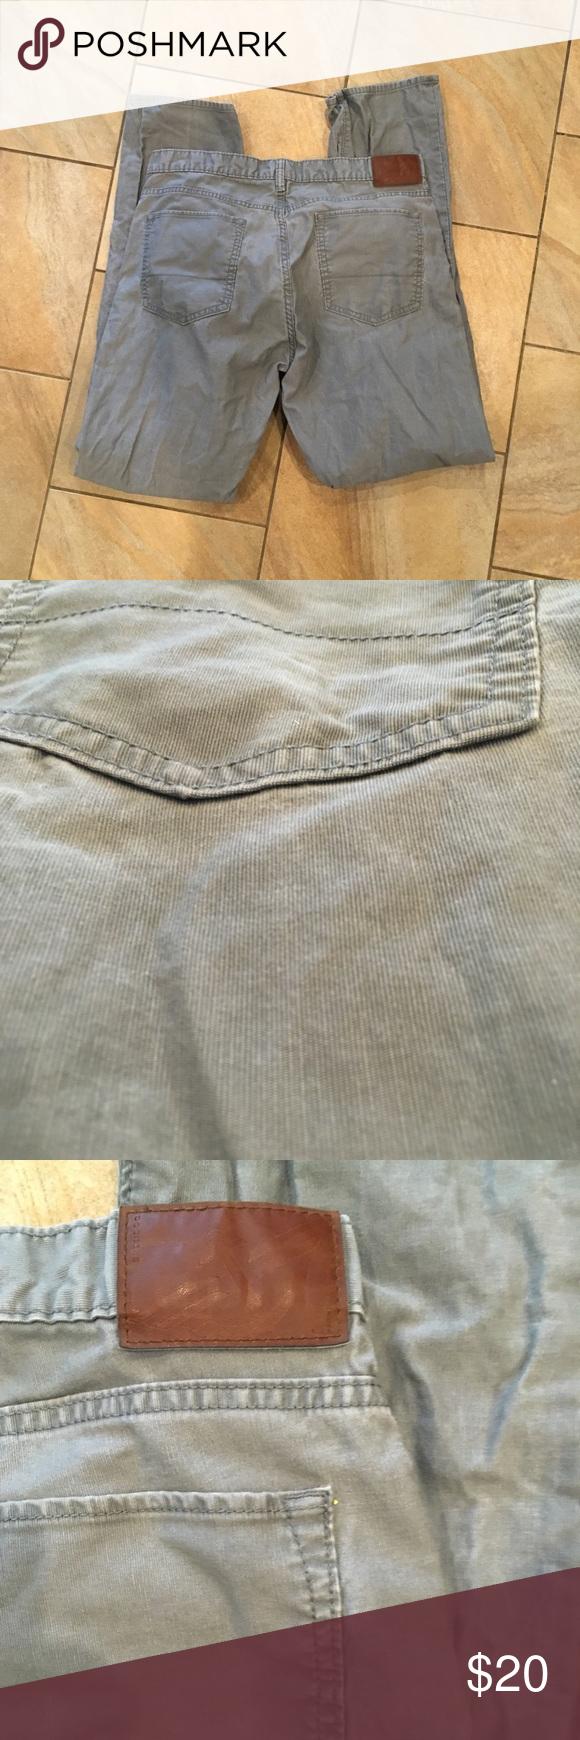 Men S Dockers Ultra Thin Ribbed Corduroy Pants These Are Grey Super Thin Ribbing Corduroy Pants Almost Denim 36x34 Pl Clothes Design Fashion Fashion Design